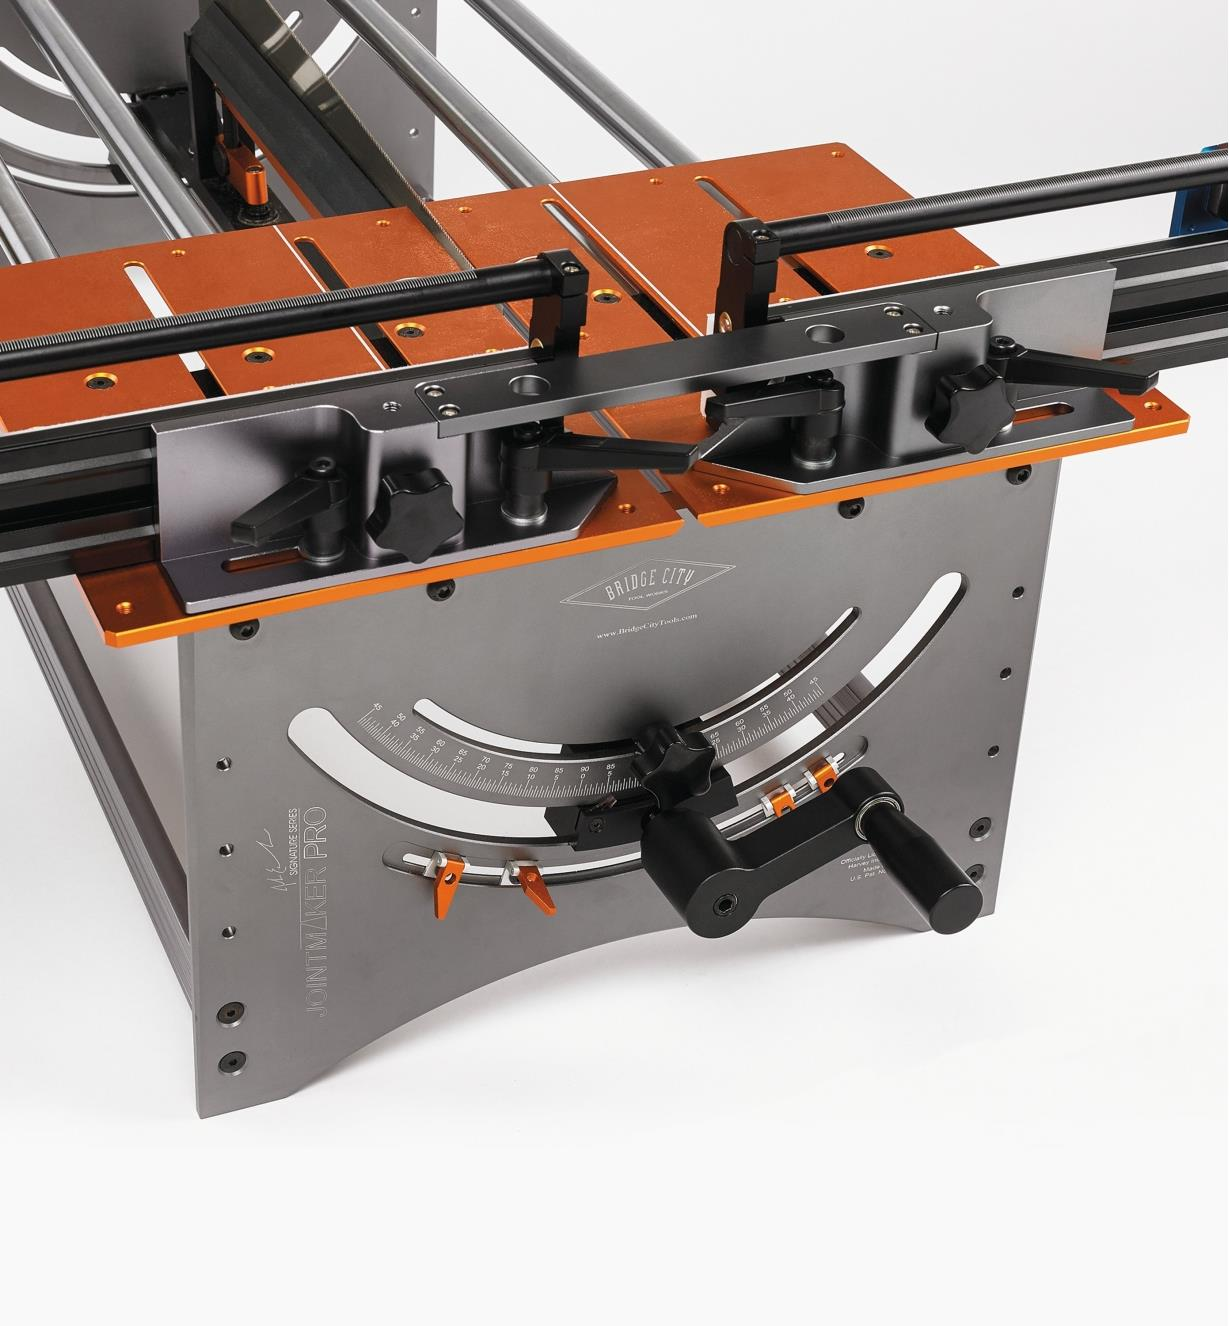 17N1711 - Bridge City Jointmaker Pro Precision Fence, Metric